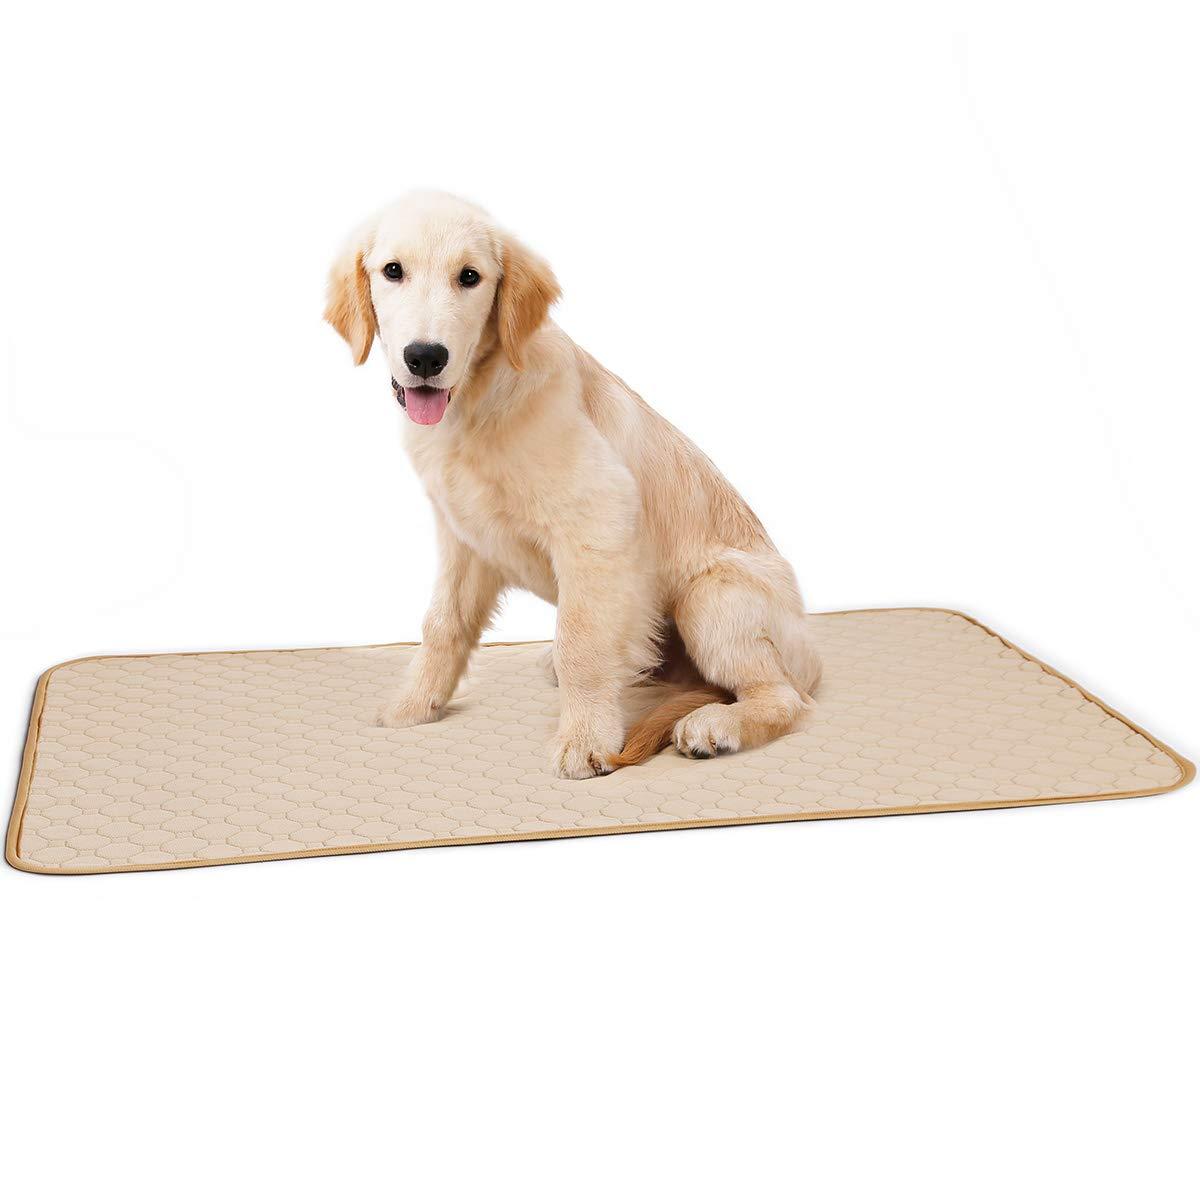 Beige L (100x67cm) Beige L (100x67cm) Penivo Waterproof Dog Pee Pad Reusable Diapers Super Absorbent Pet Cat Training Pee Pad Diaper Antibacterial Puppy Dog Nappy Cleaning Cage Mat (L (100x67cm), Beige)